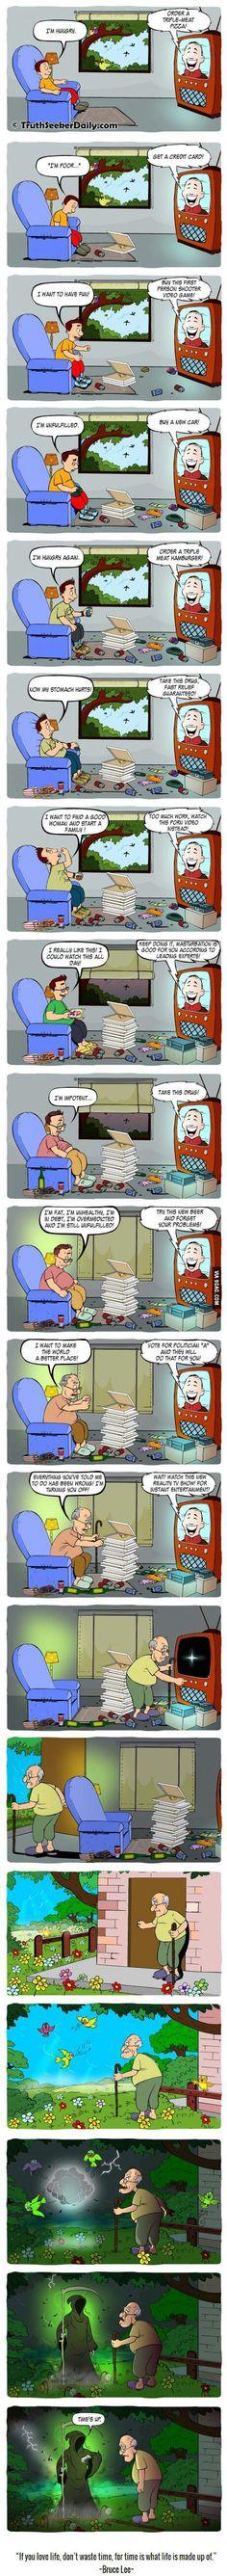 An accurate description of life.